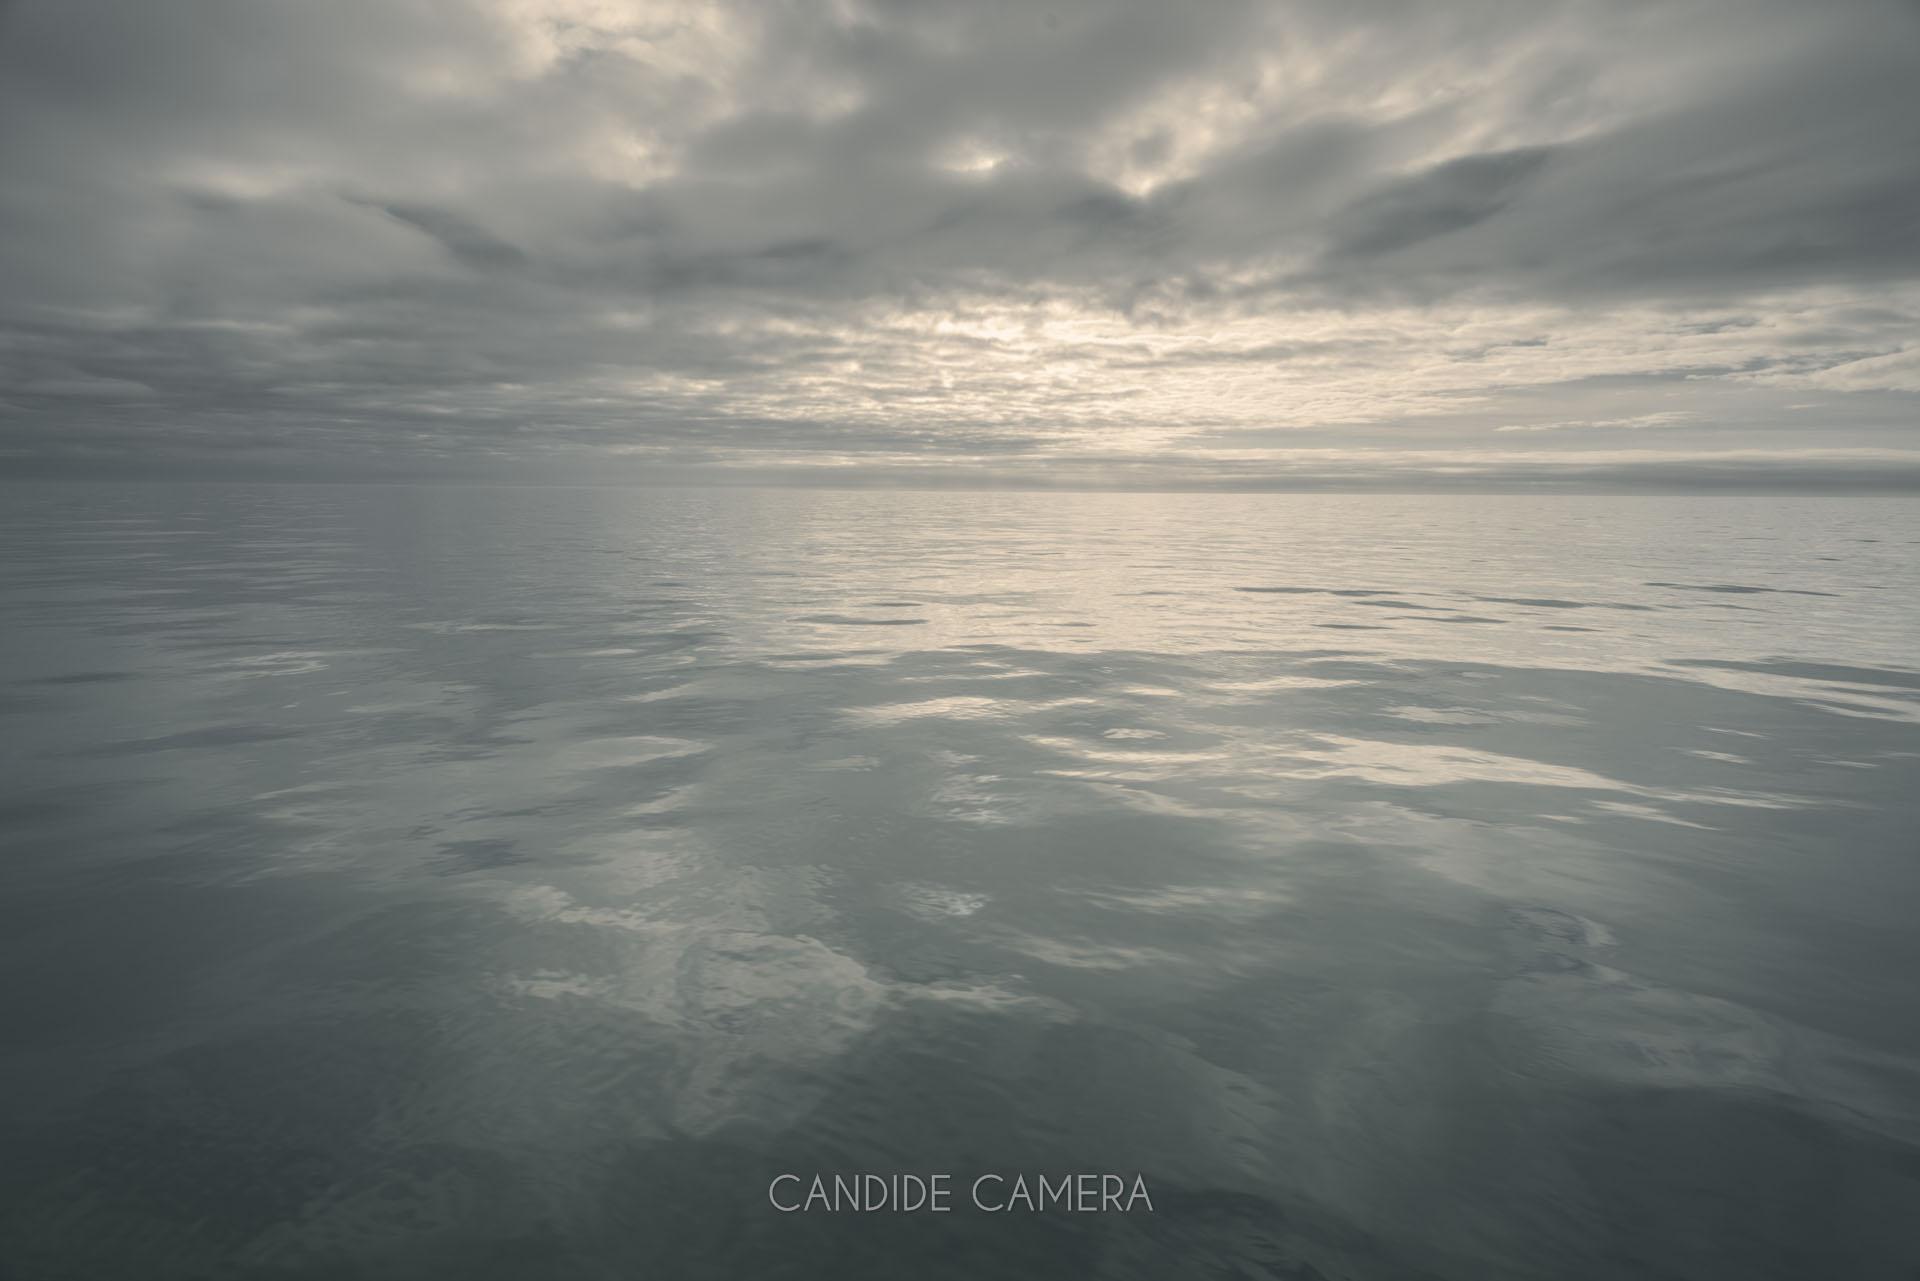 ©_CANDIDE_CAMERA_SERENITY-7219